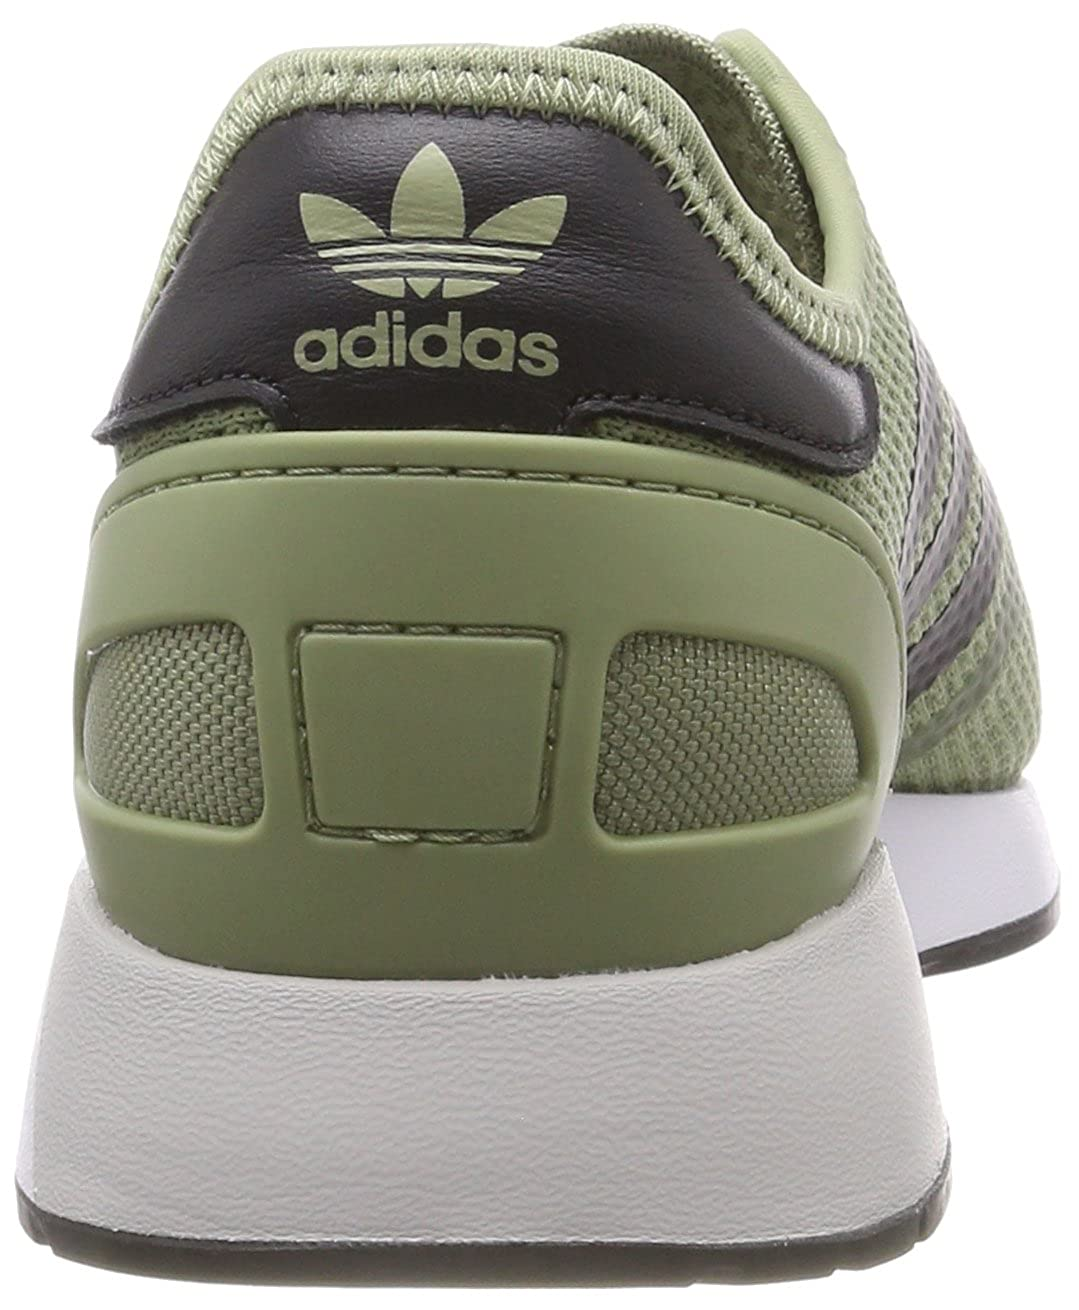 adidas Herren N 5923 Sneaker Schuhe & Handtaschen B07MWLZ6GW